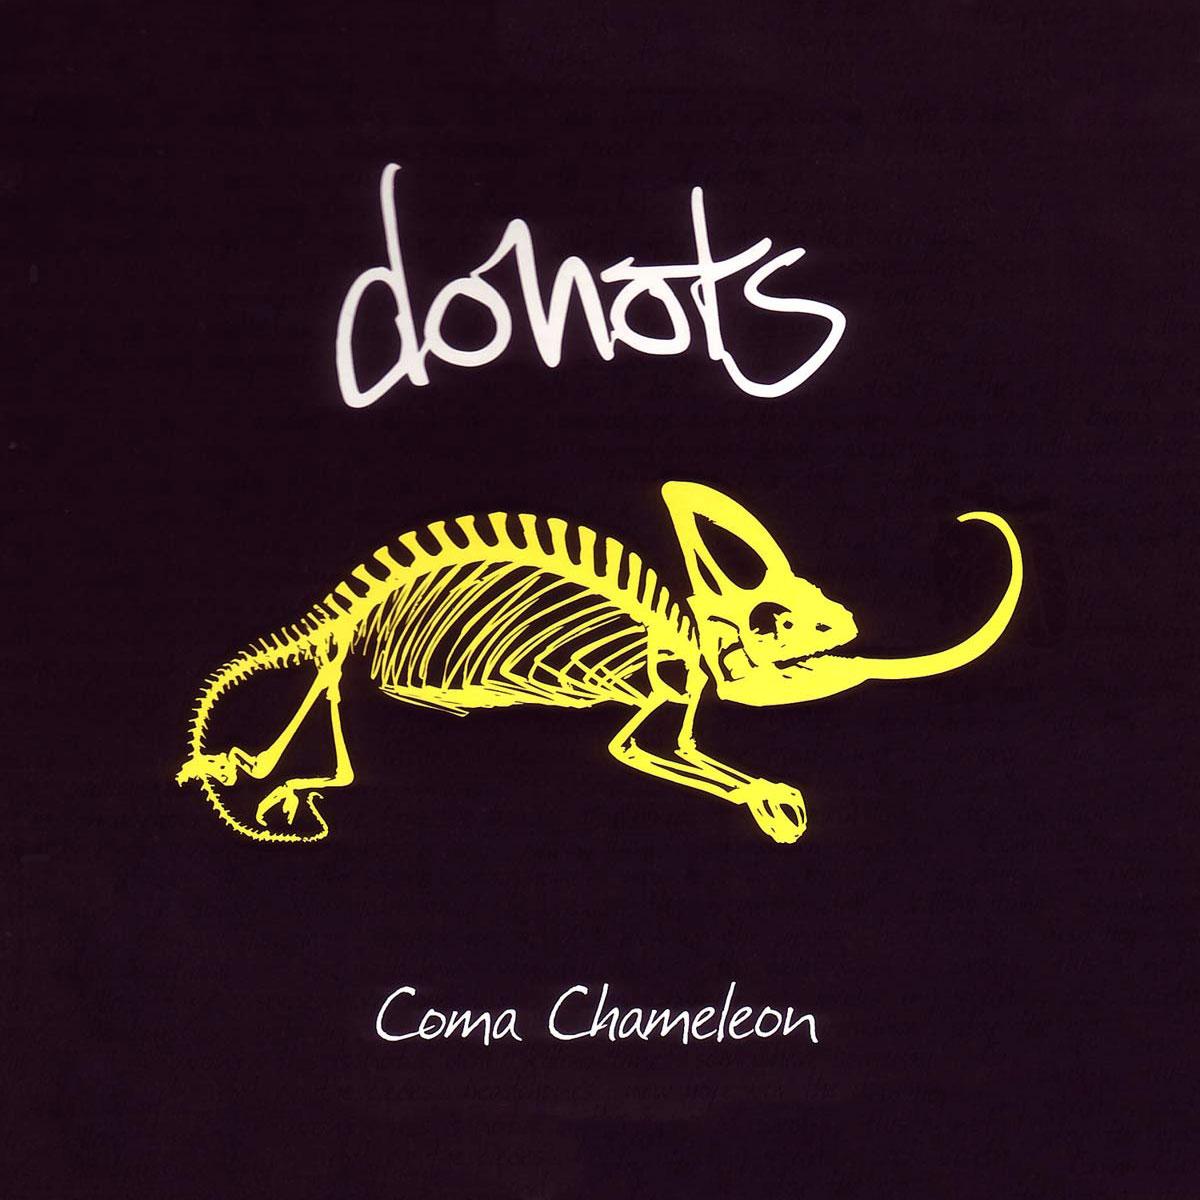 Donots - Coma Chameleon